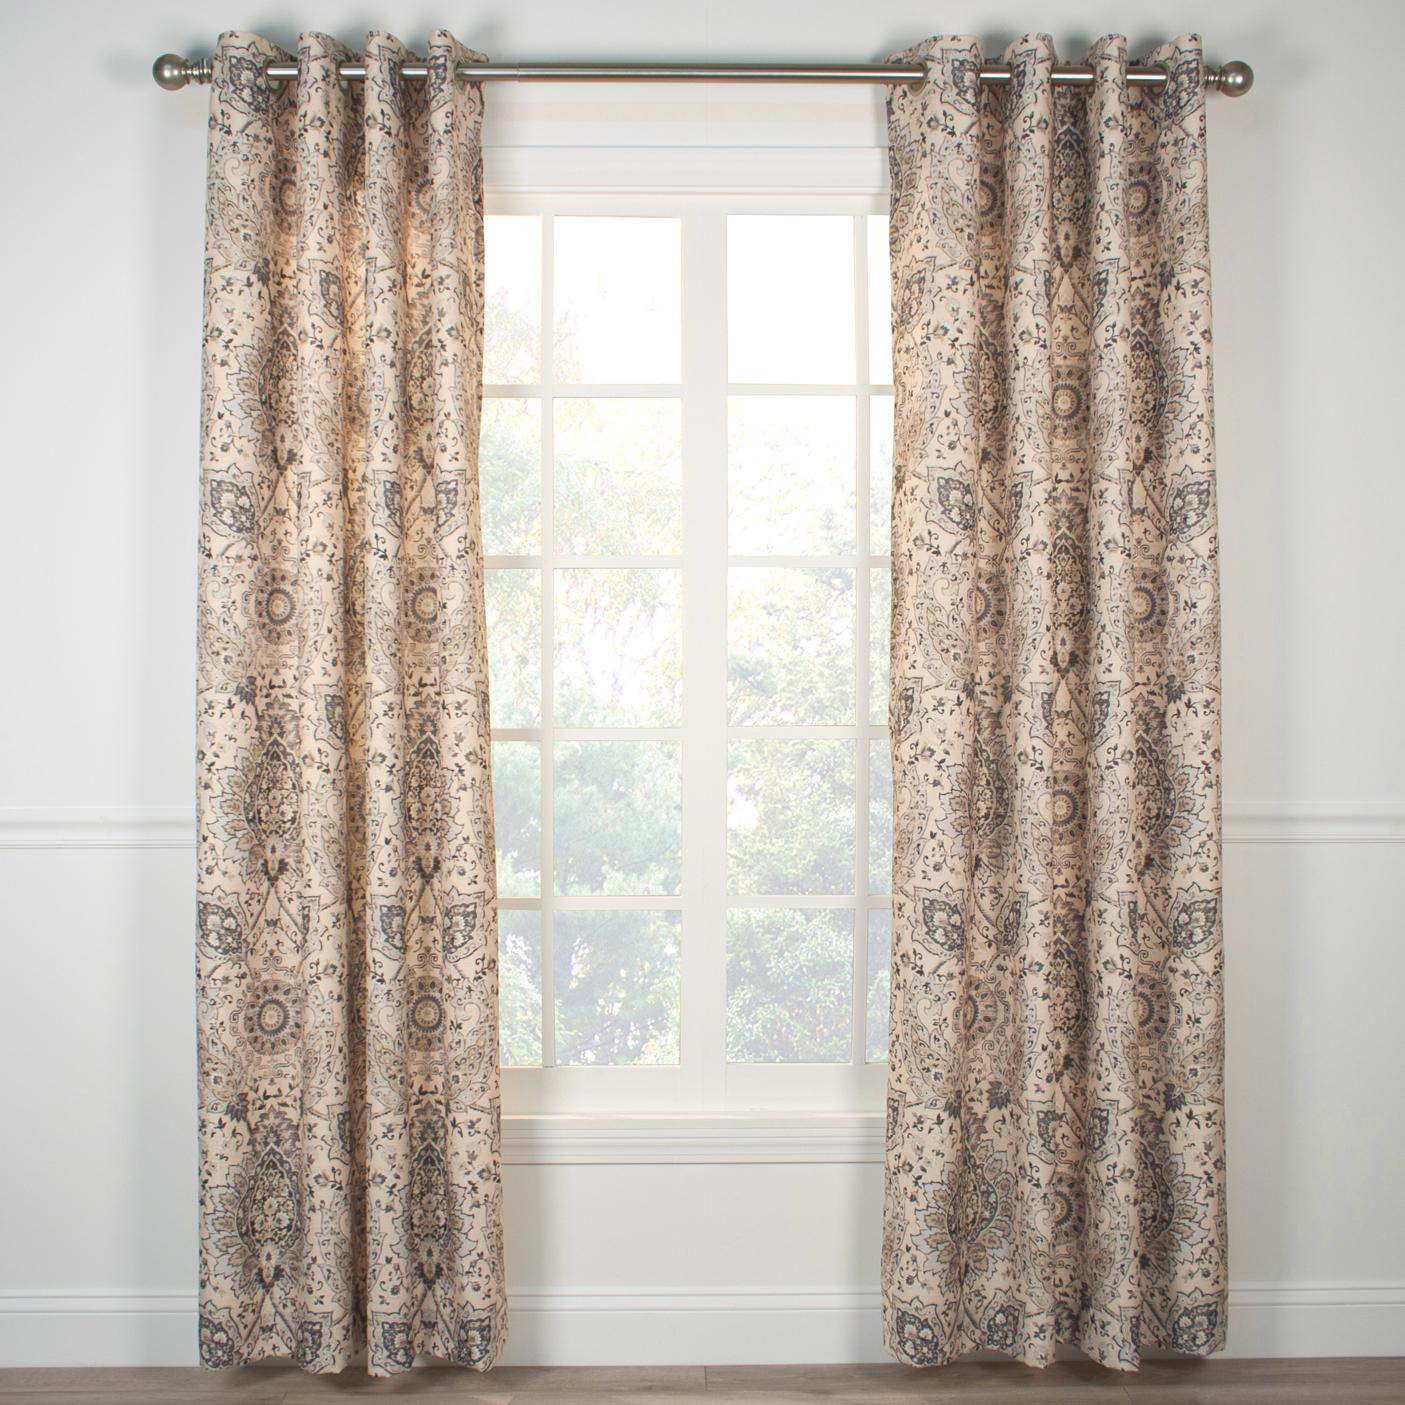 Cadogen Grommet Top Curtain Panel for Grommet Curtain Panels (Image 7 of 20)